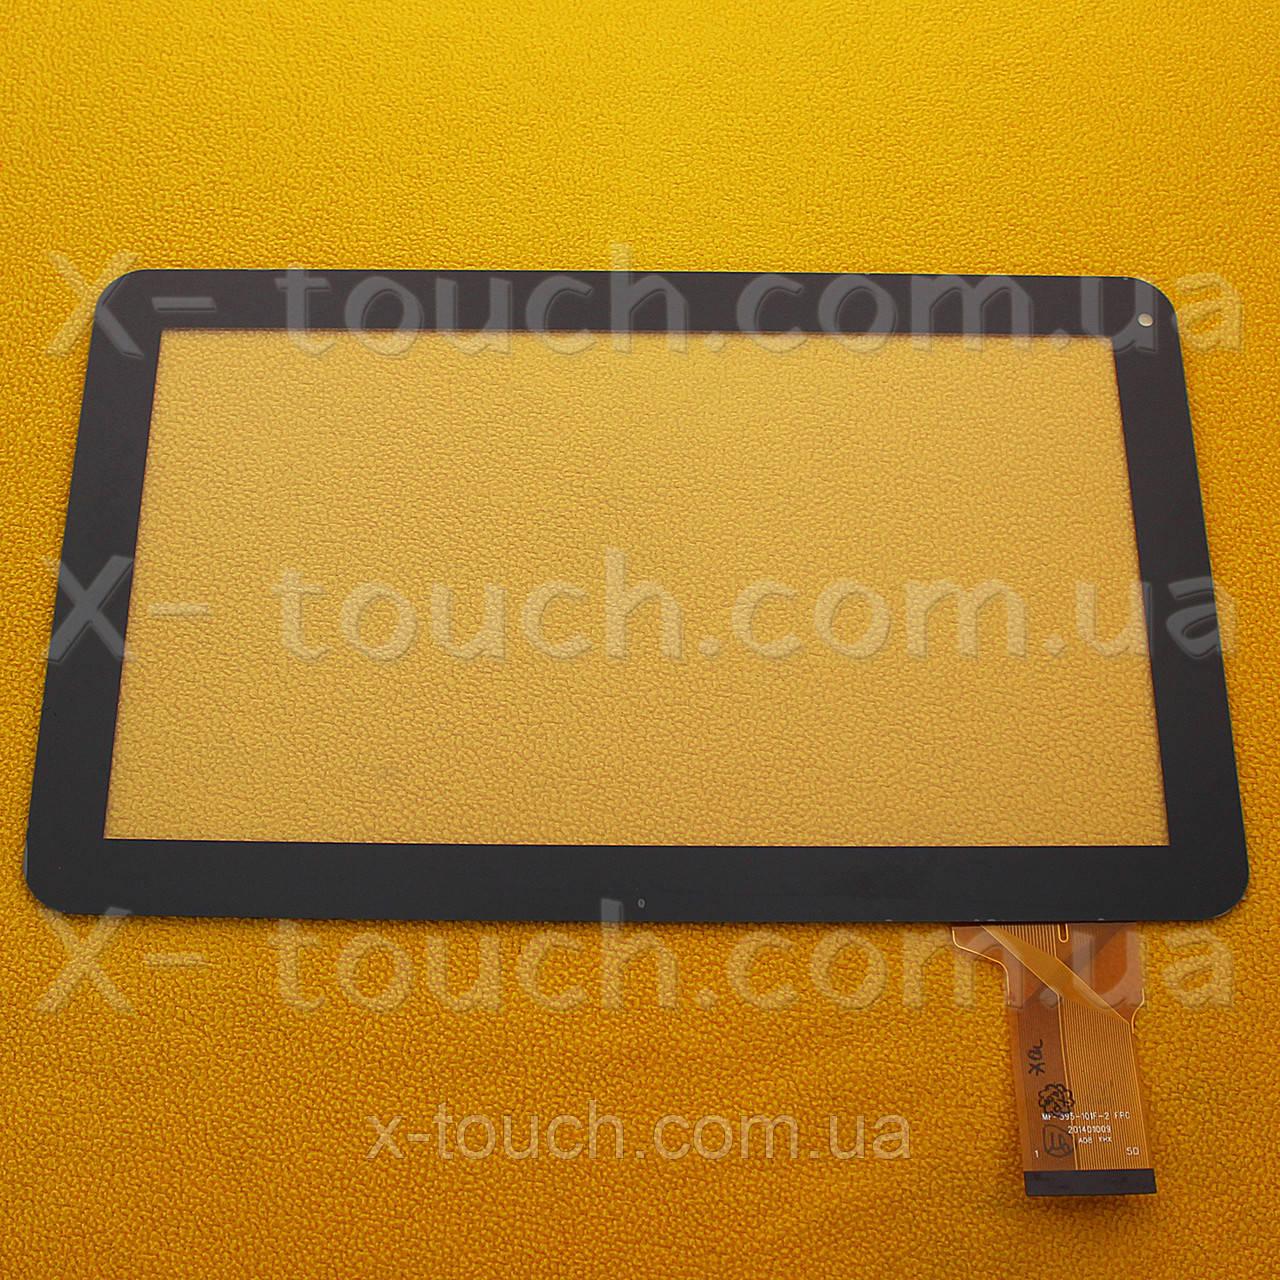 Тачскрин, сенсор GT101QLT1007 для планшета,бел